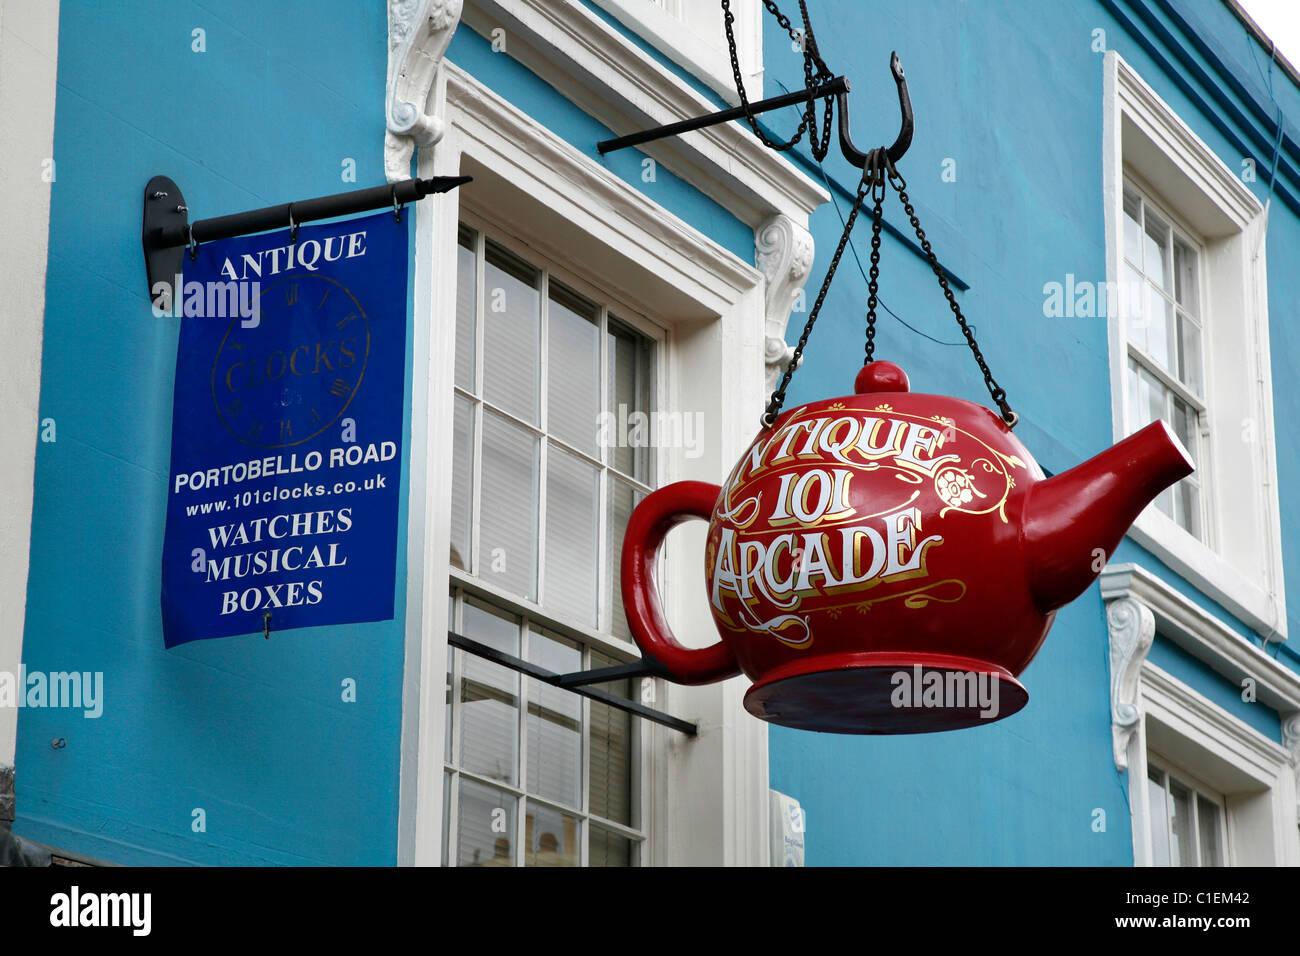 Teapot sign for Antique 101 Arcade on Portobello Road, Notting Hill, London, UK - Stock Image